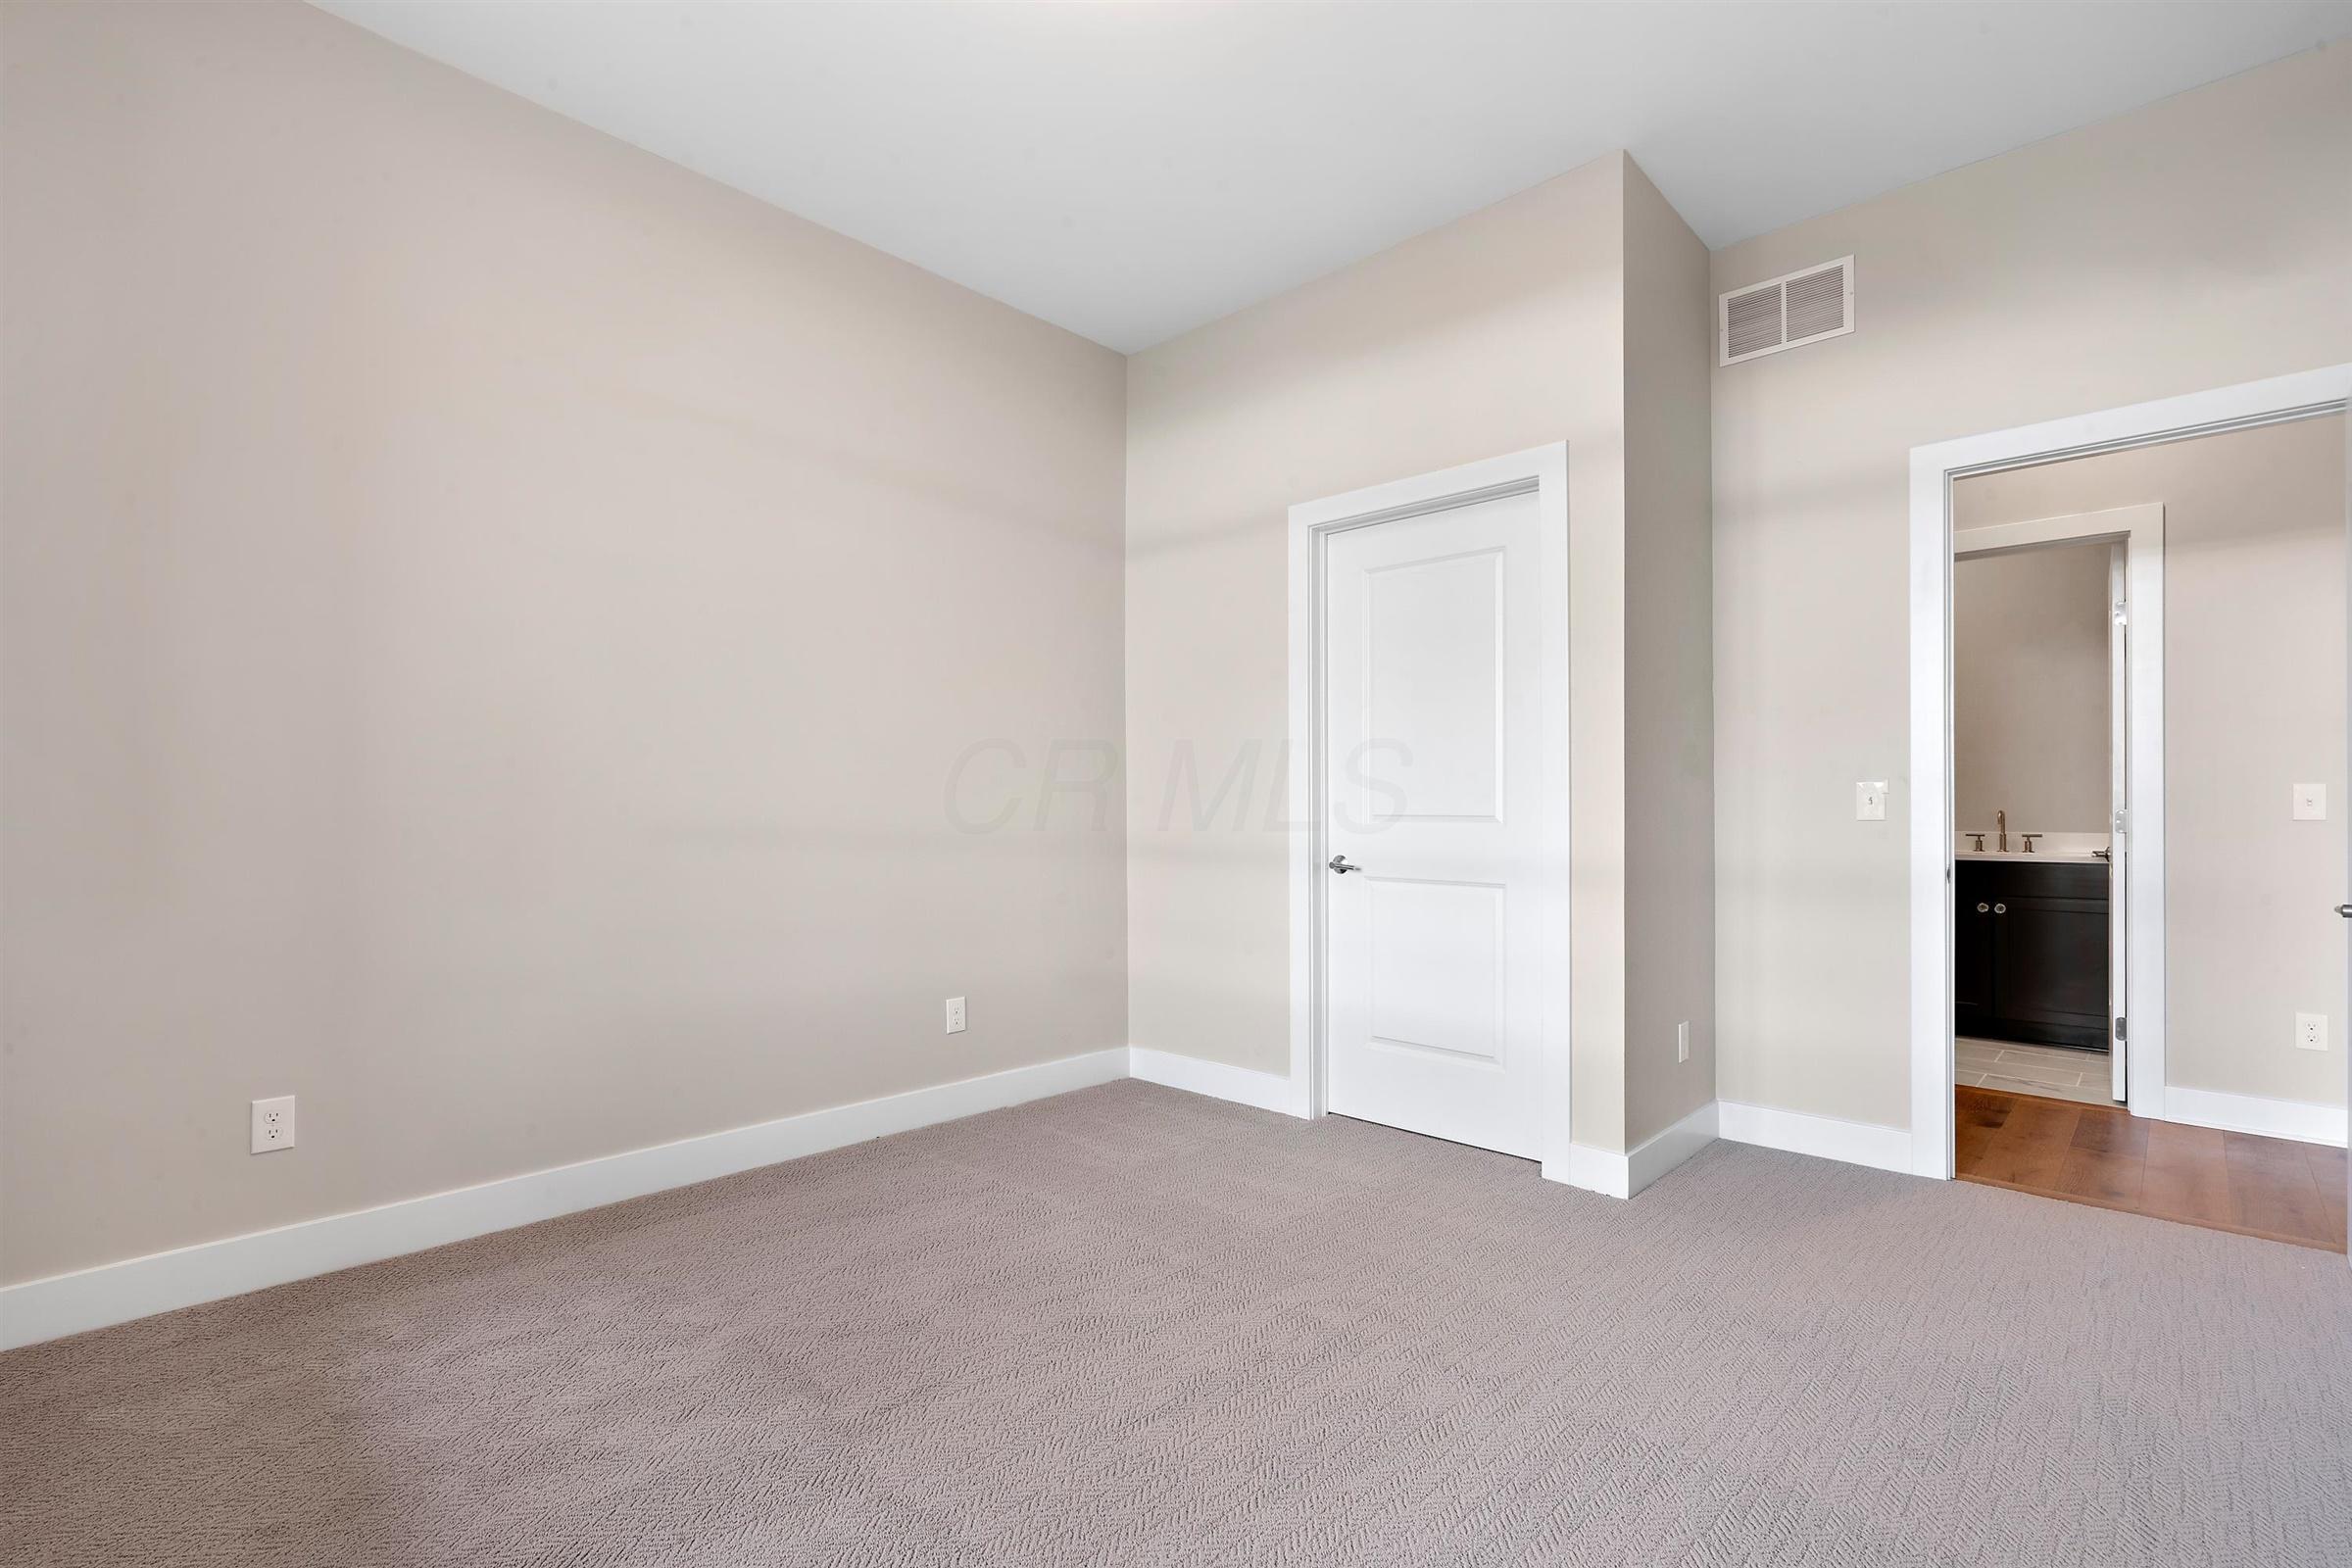 6745 Longshore Street, Dublin, Ohio 43017, 3 Bedrooms Bedrooms, ,3 BathroomsBathrooms,Residential,For Sale,Longshore,220024428